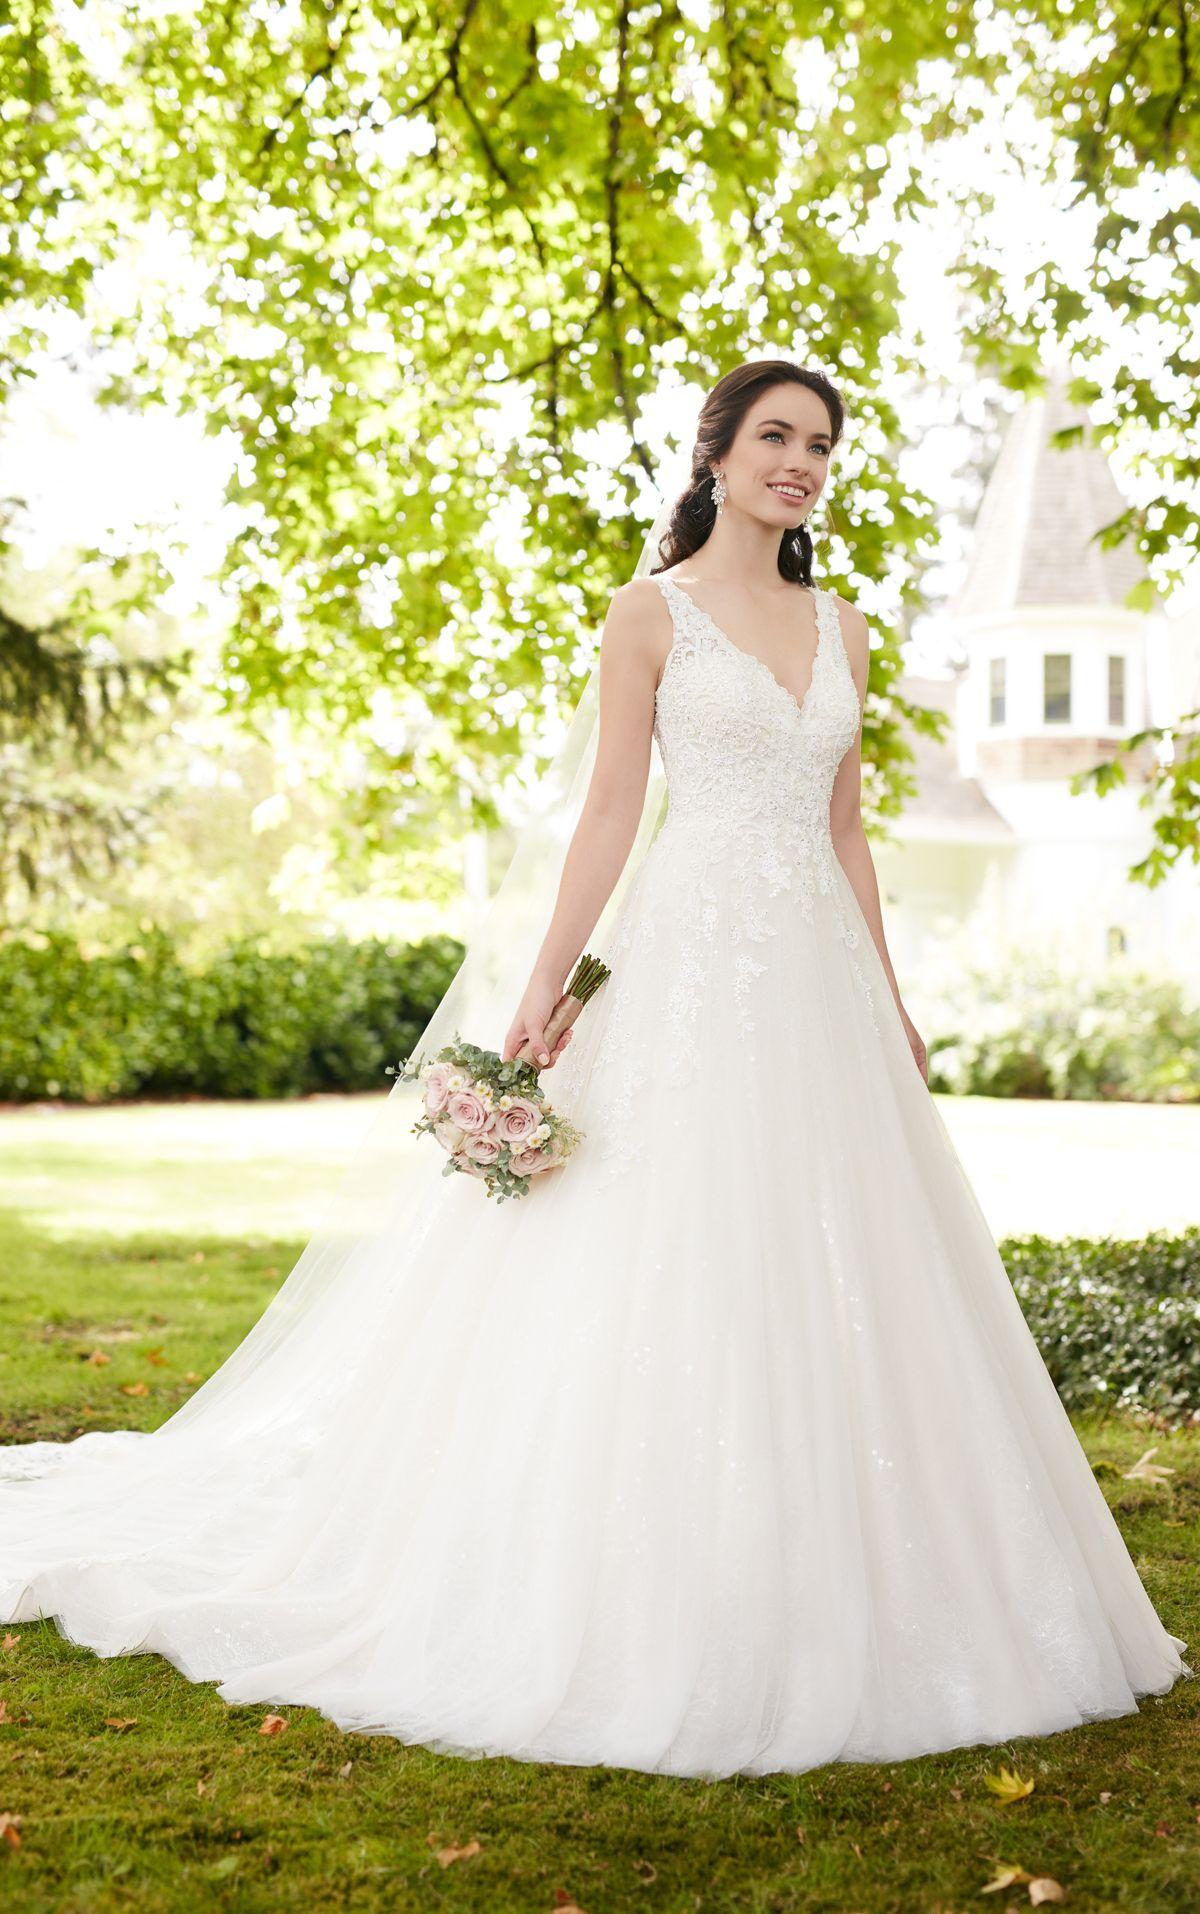 Beaded ball gown wedding dress  Wedding Dresses  Ball gowns Wedding dress and Gowns